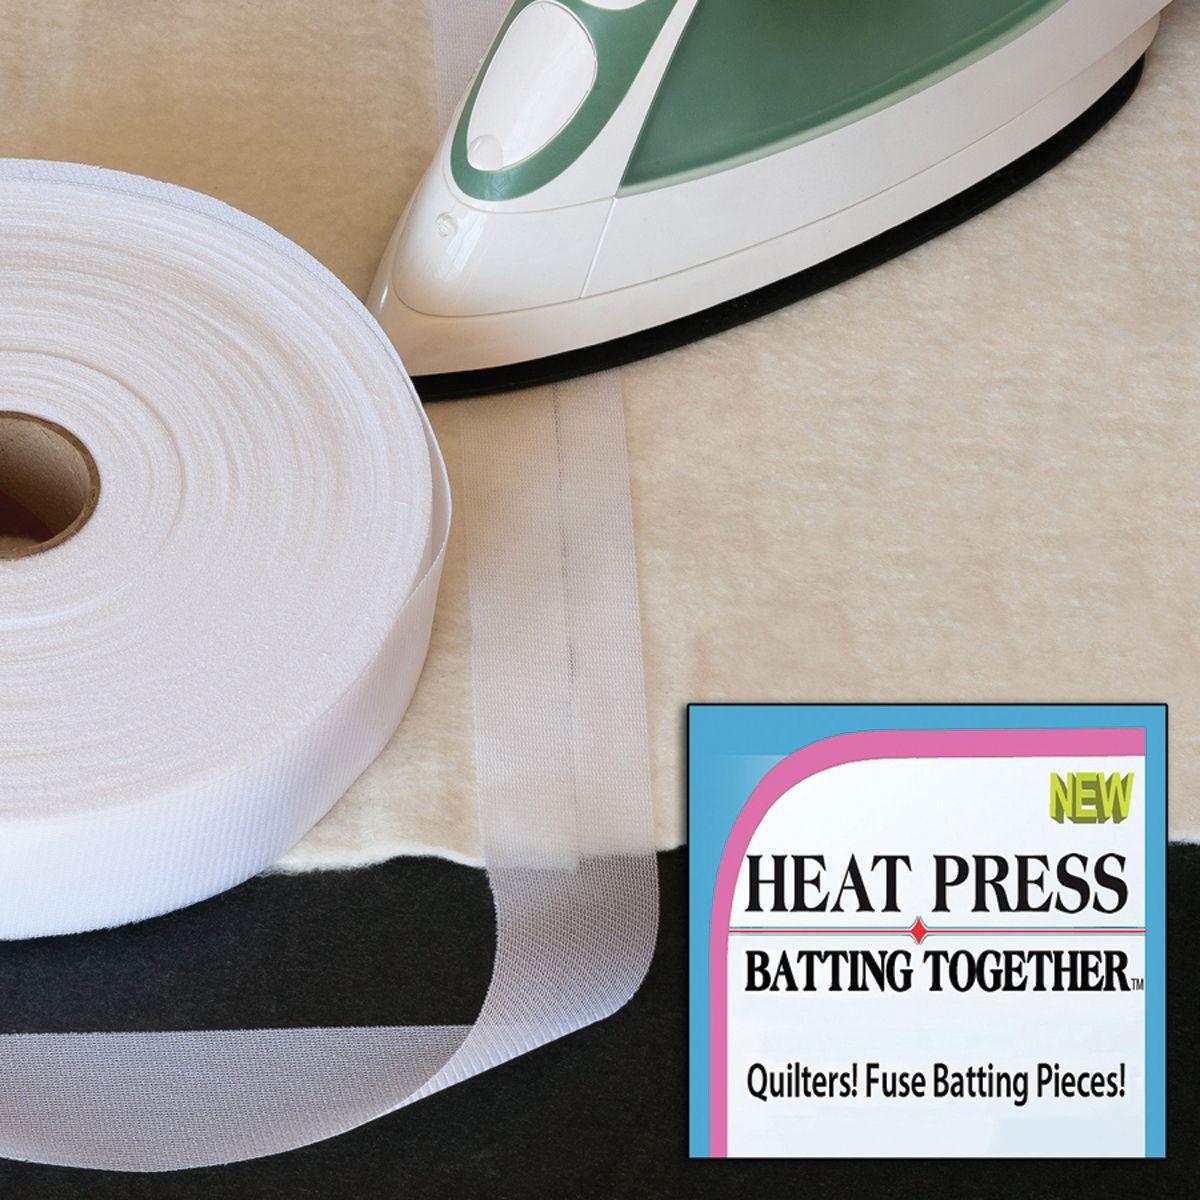 Ruban thermocollant Heat Press Batting Together